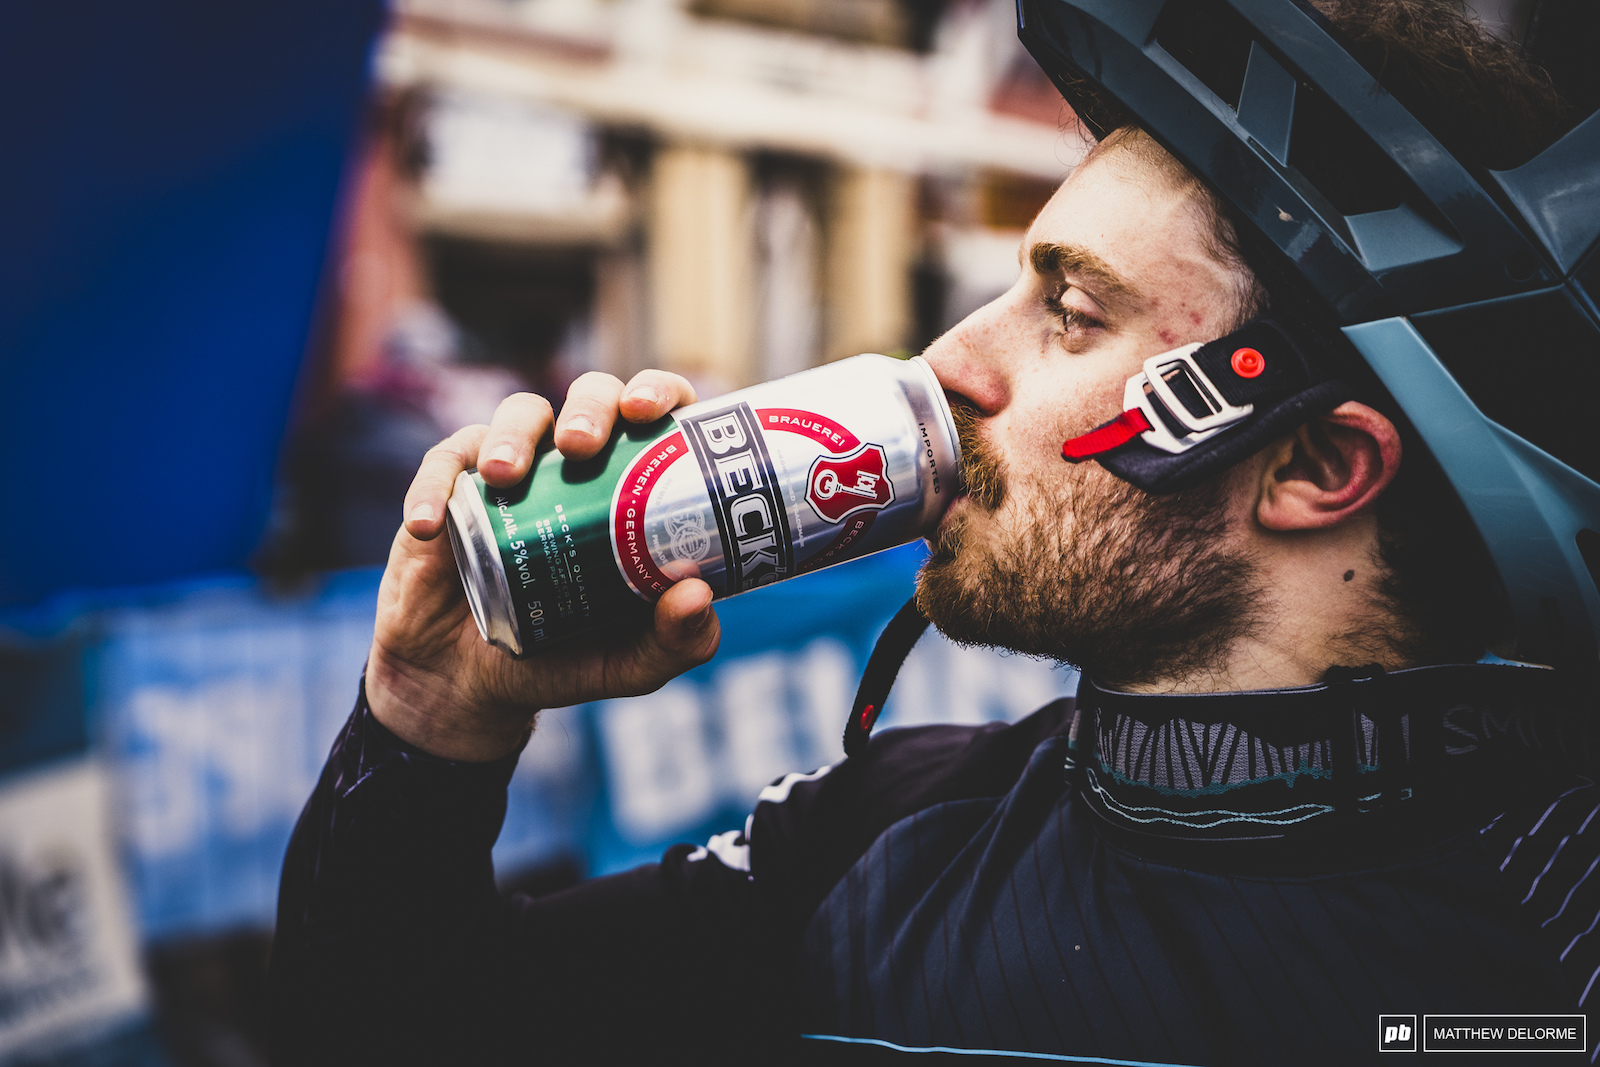 Jesse Melamed tosses back a well deserved beer after a brilliant day on the bike.